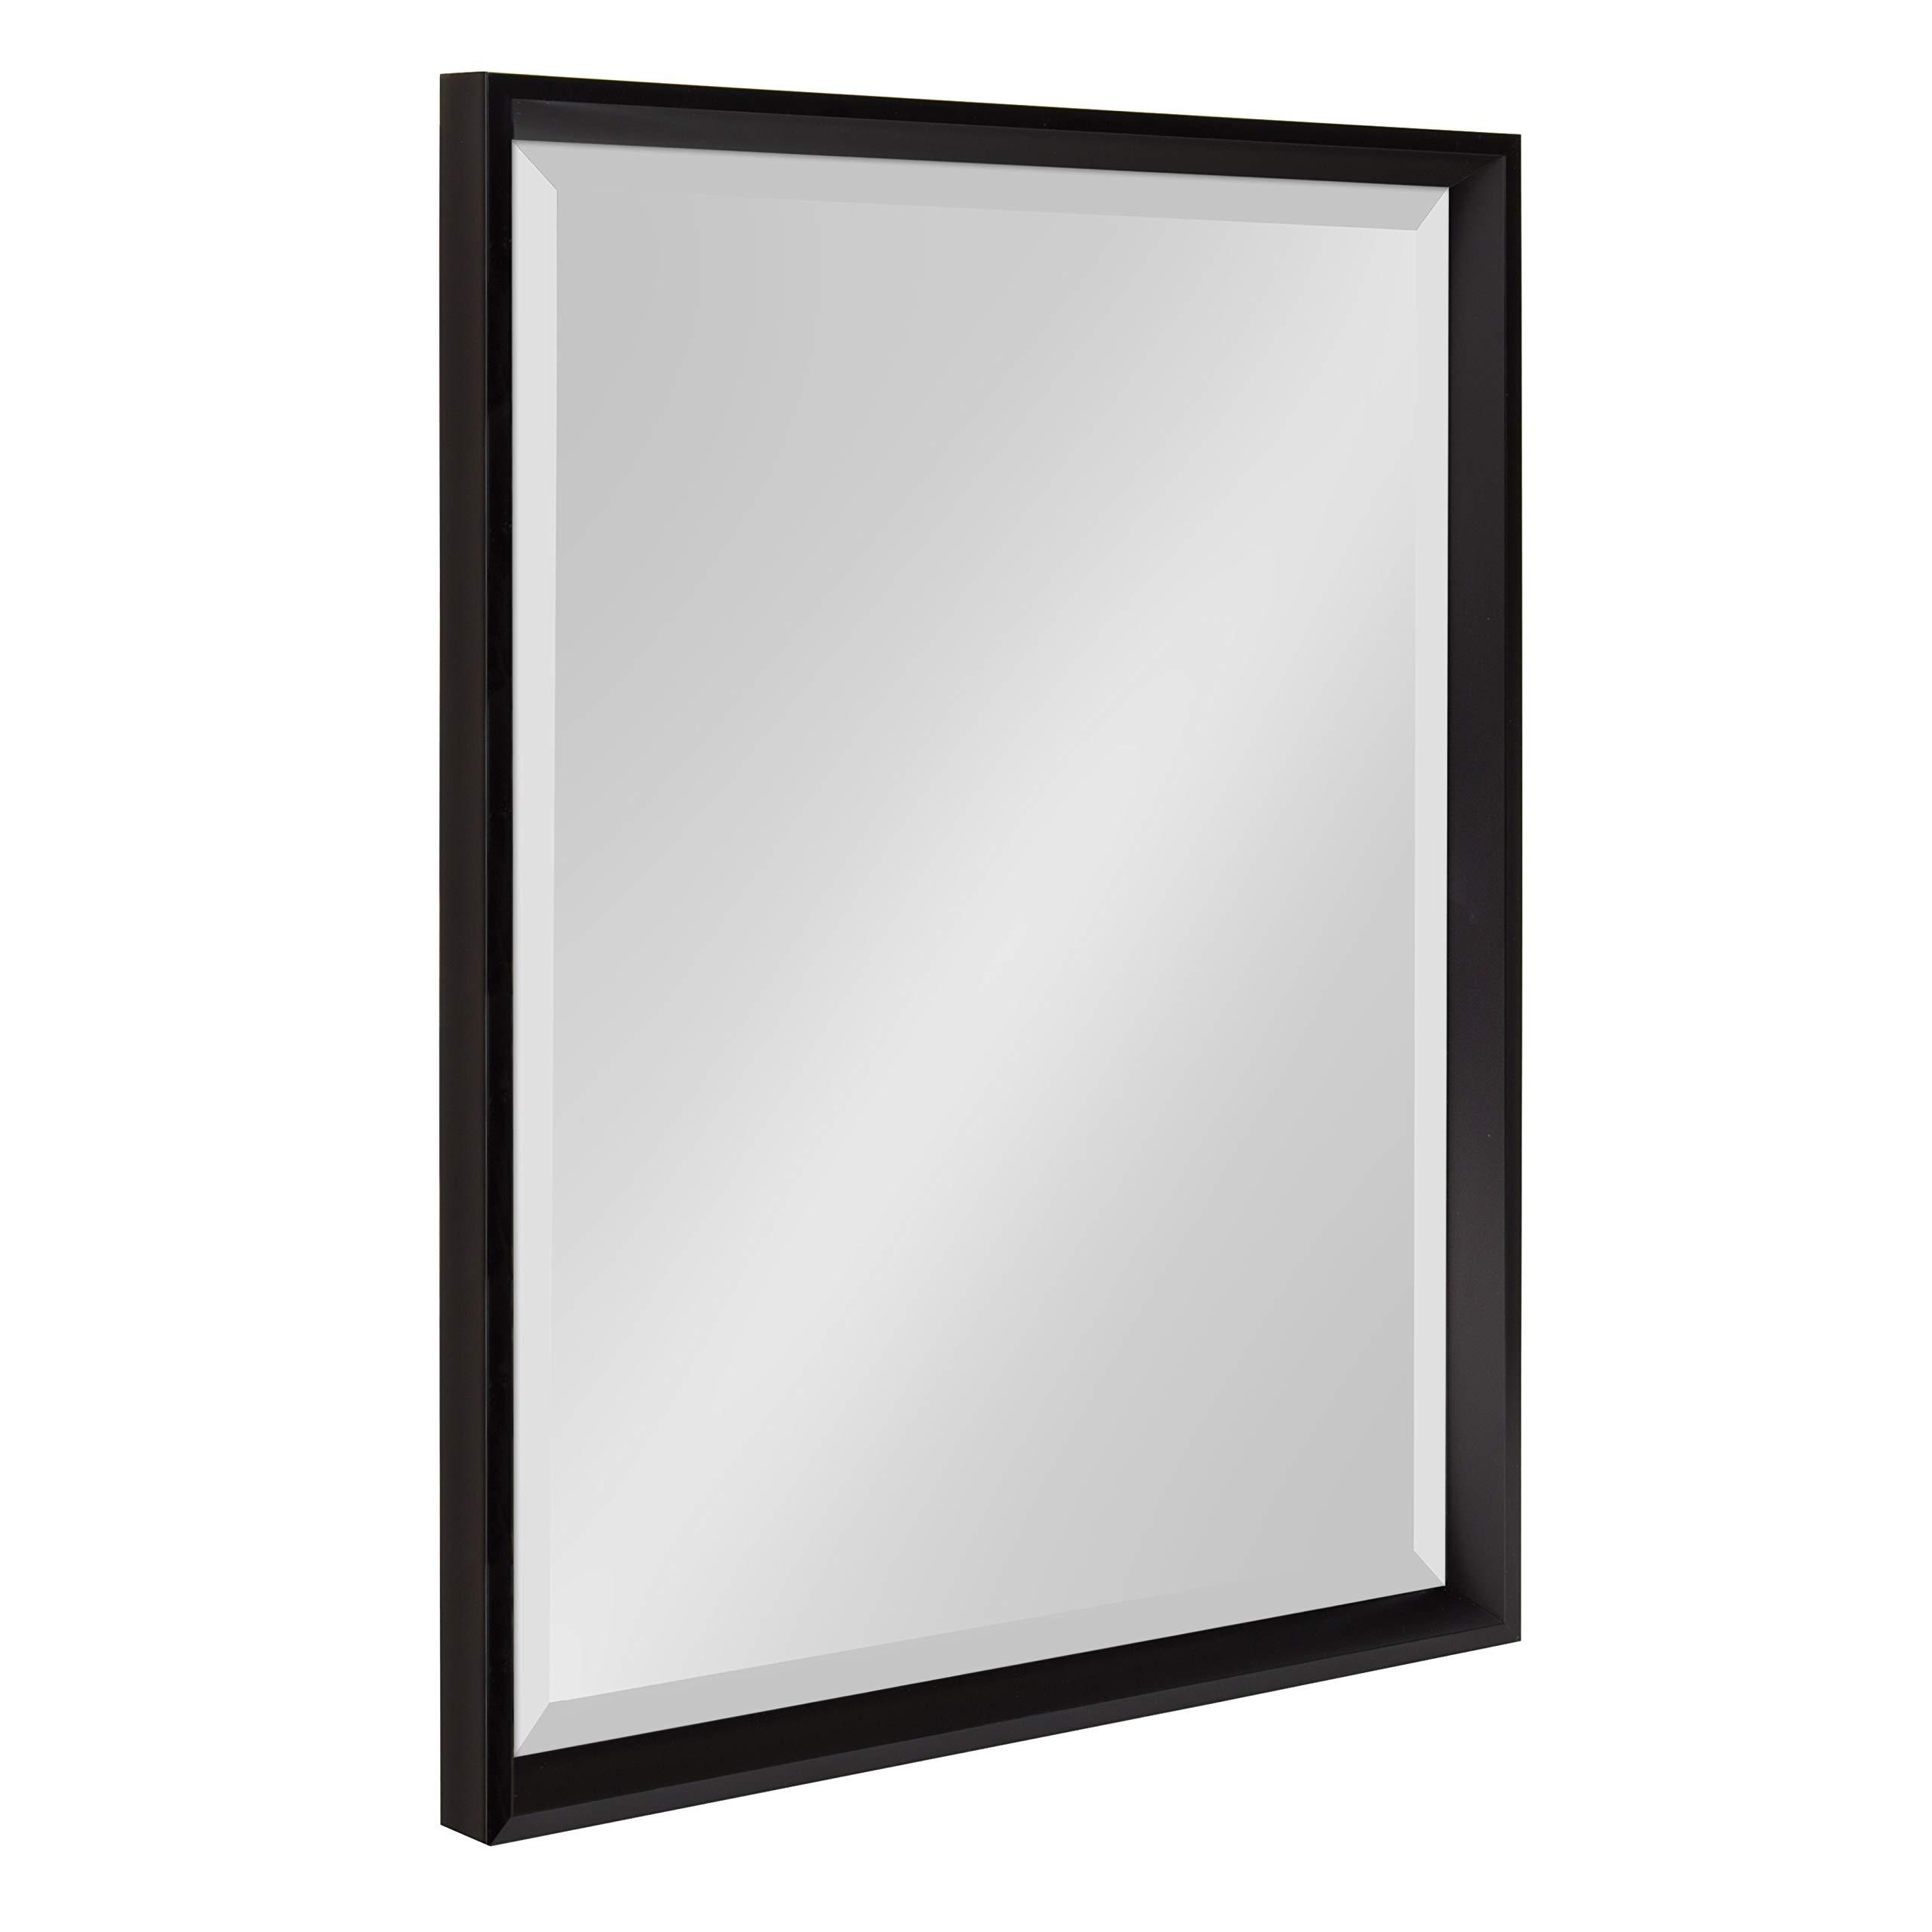 Kate and Laurel Calter Modern Decorative Framed Beveled Wall Mirror, 19.5x25.5 Black